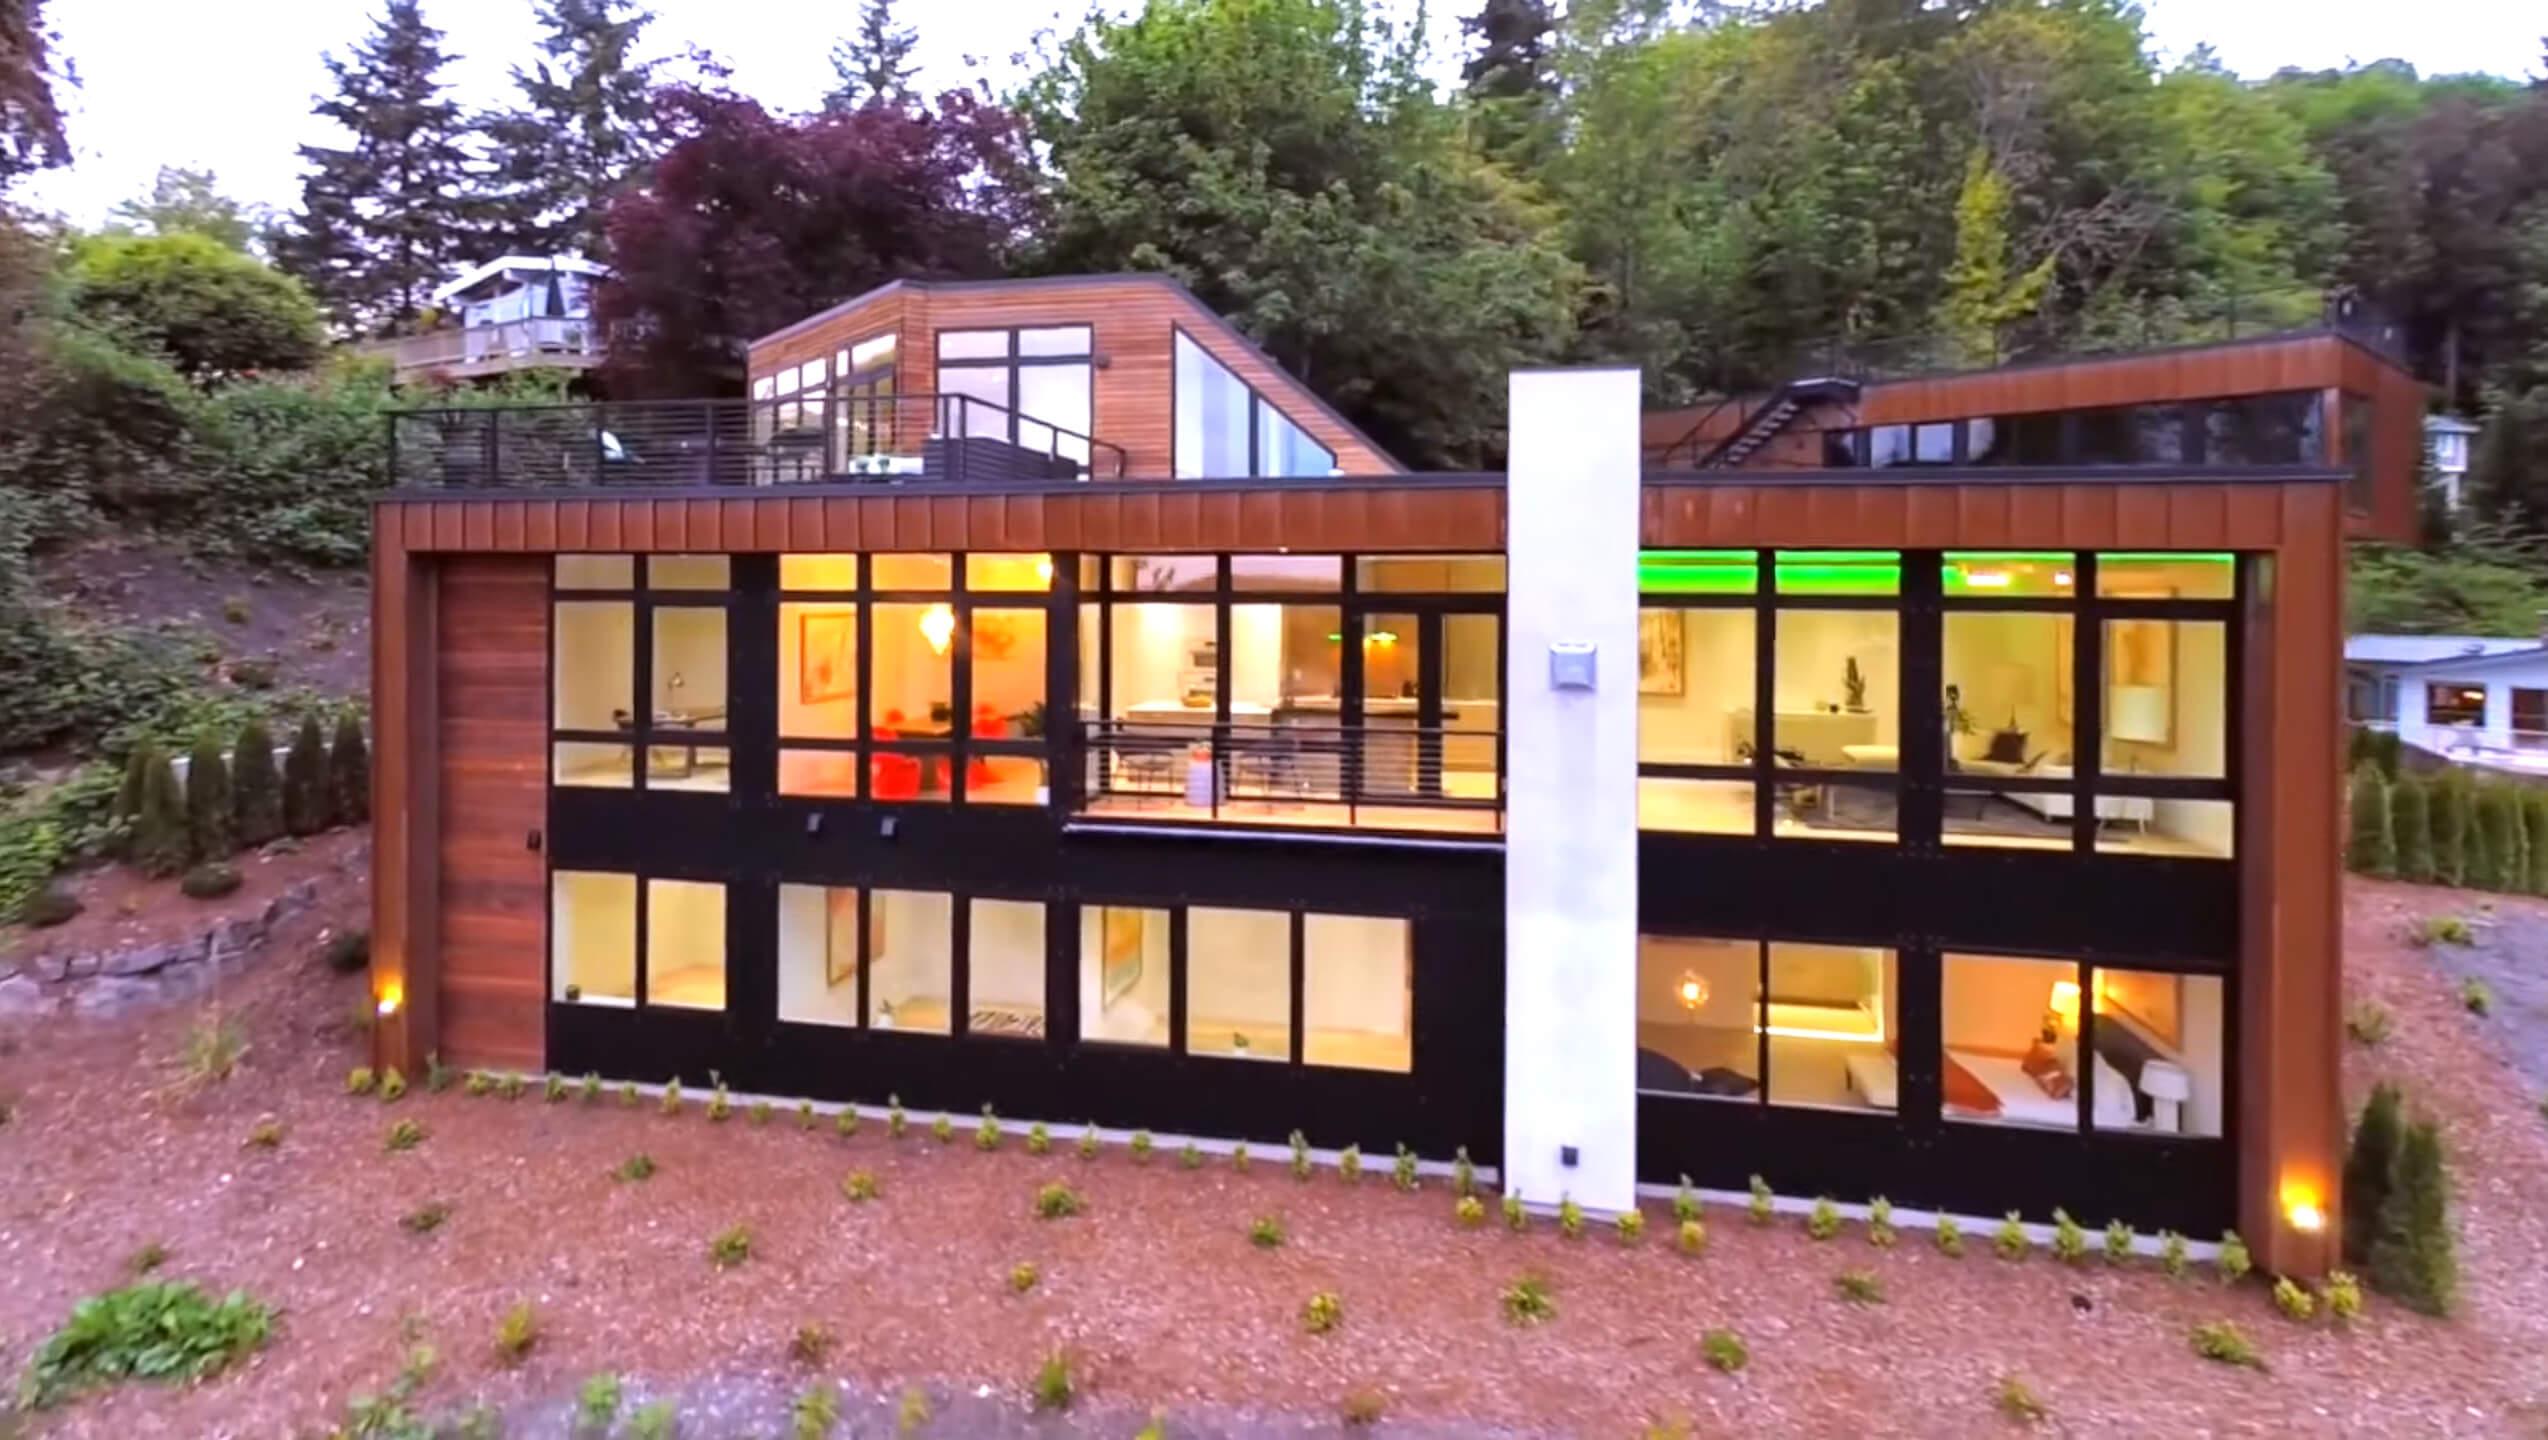 euroline-windows-homepage-hero-building-exterior